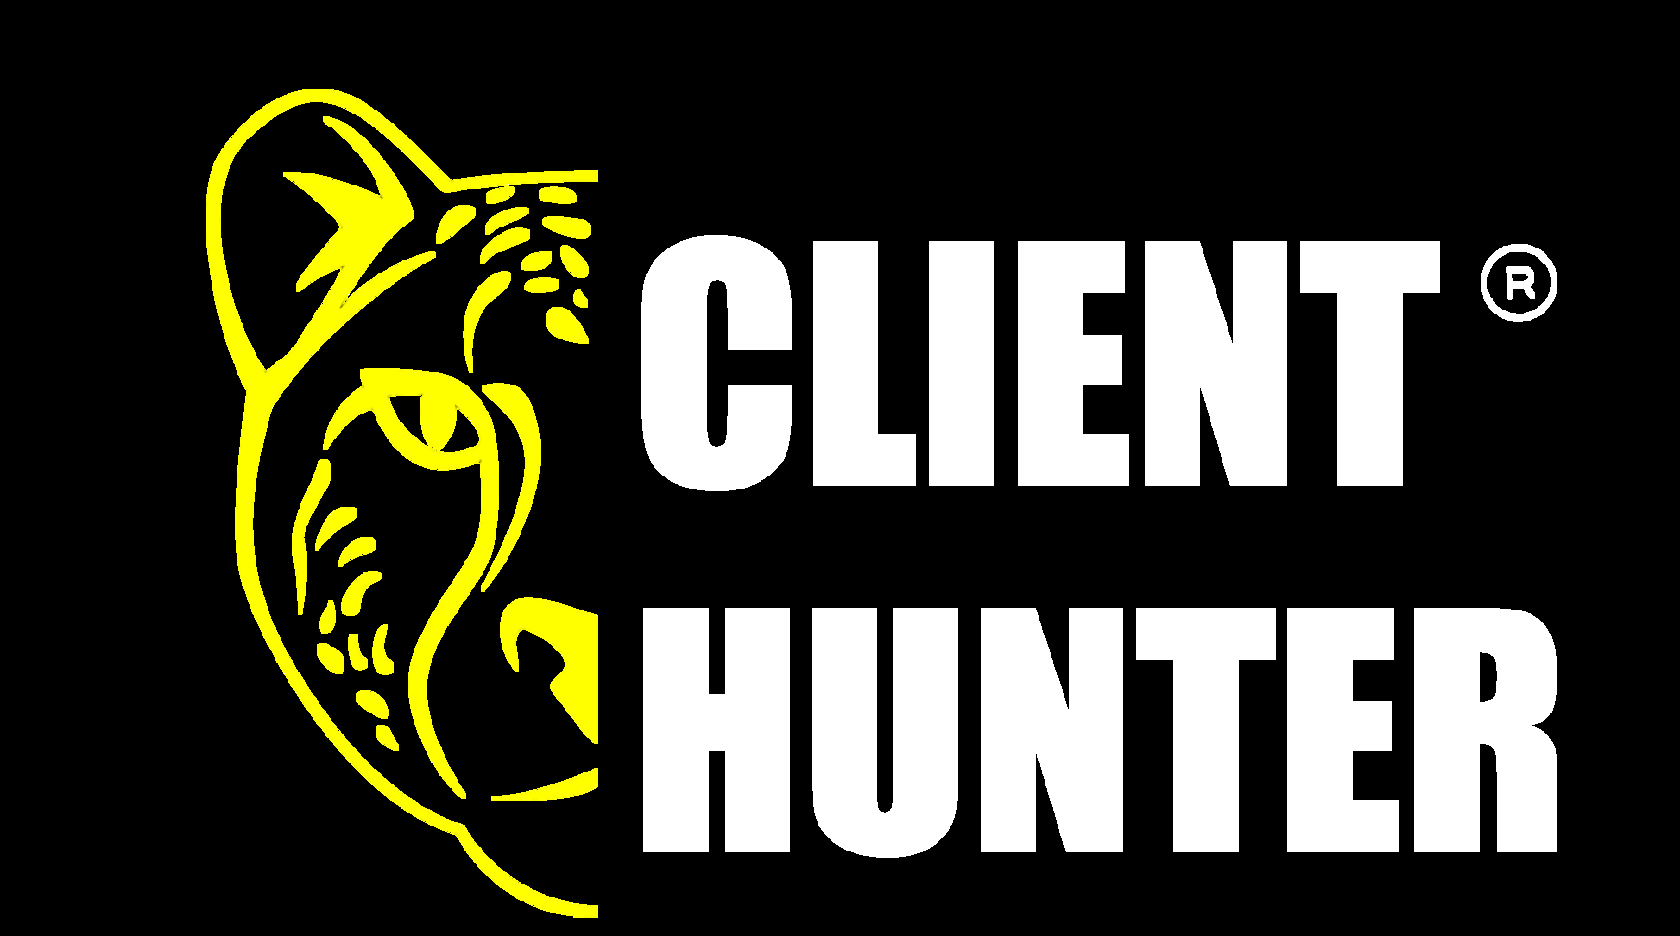 ClientHunter